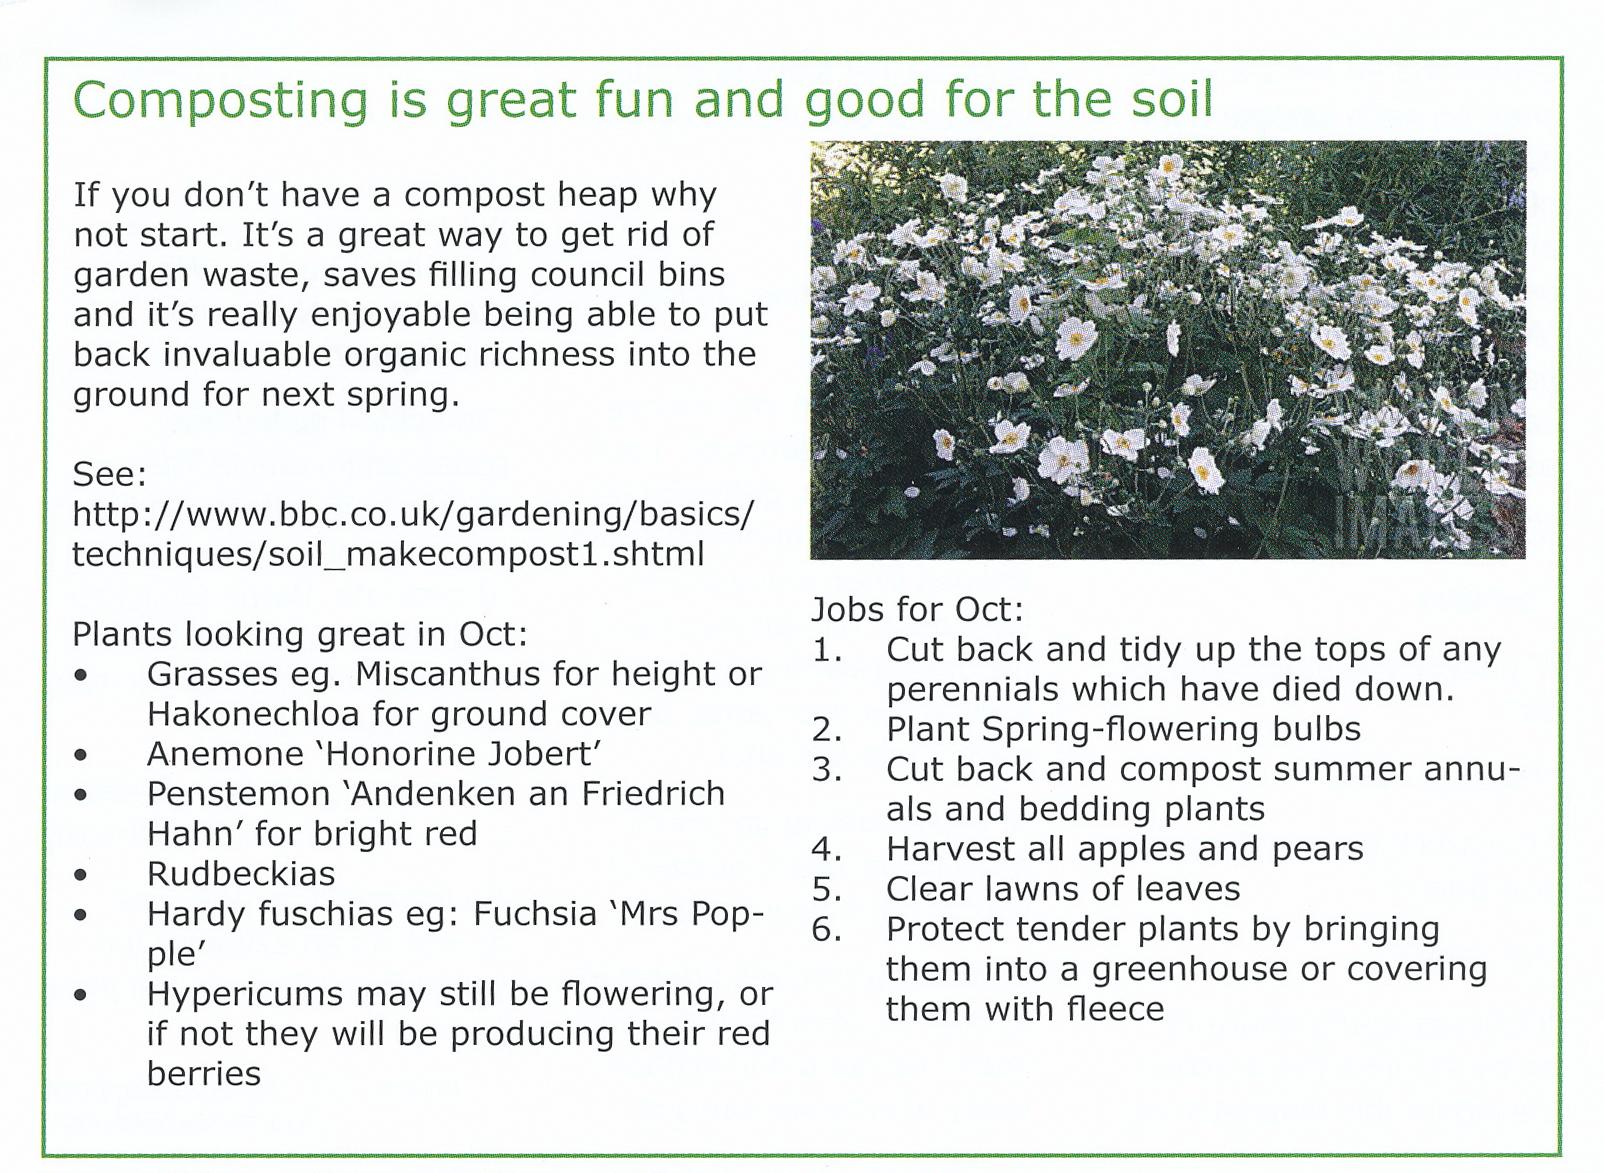 Garden jobs for October